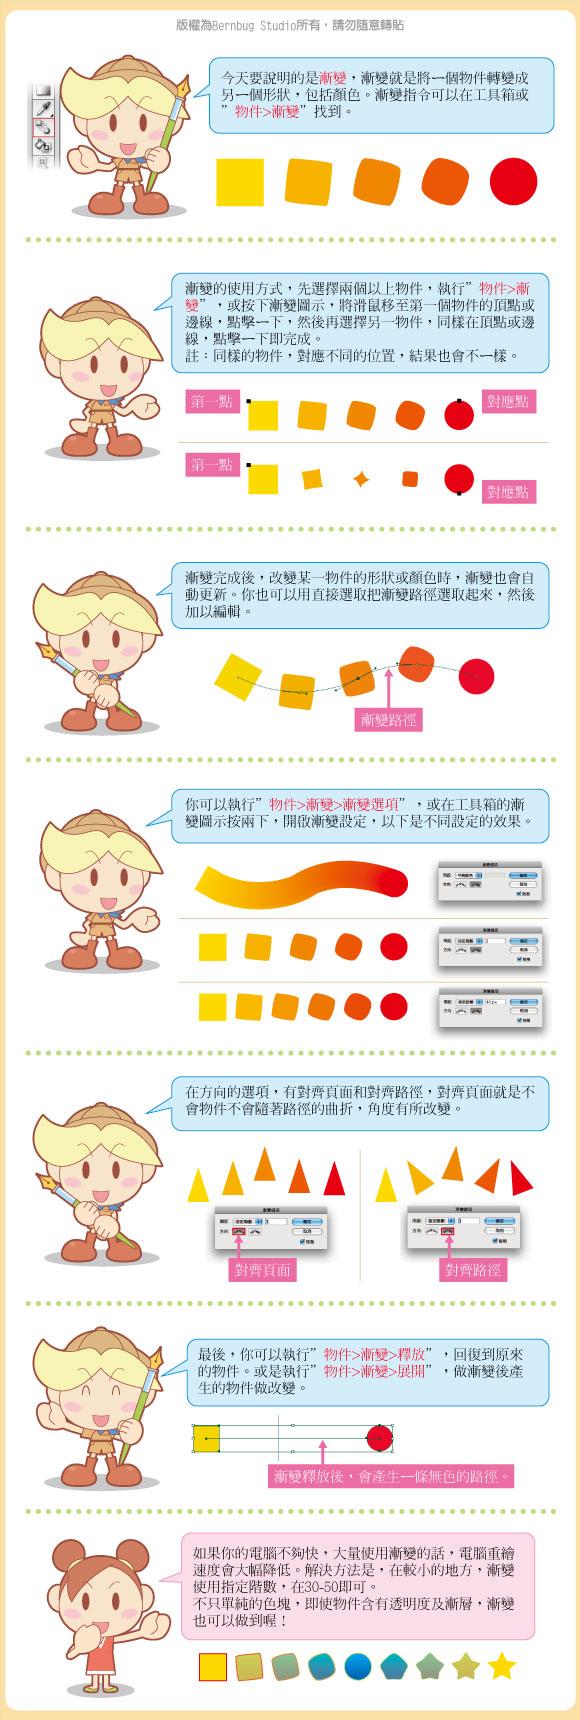 lesson19.jpg